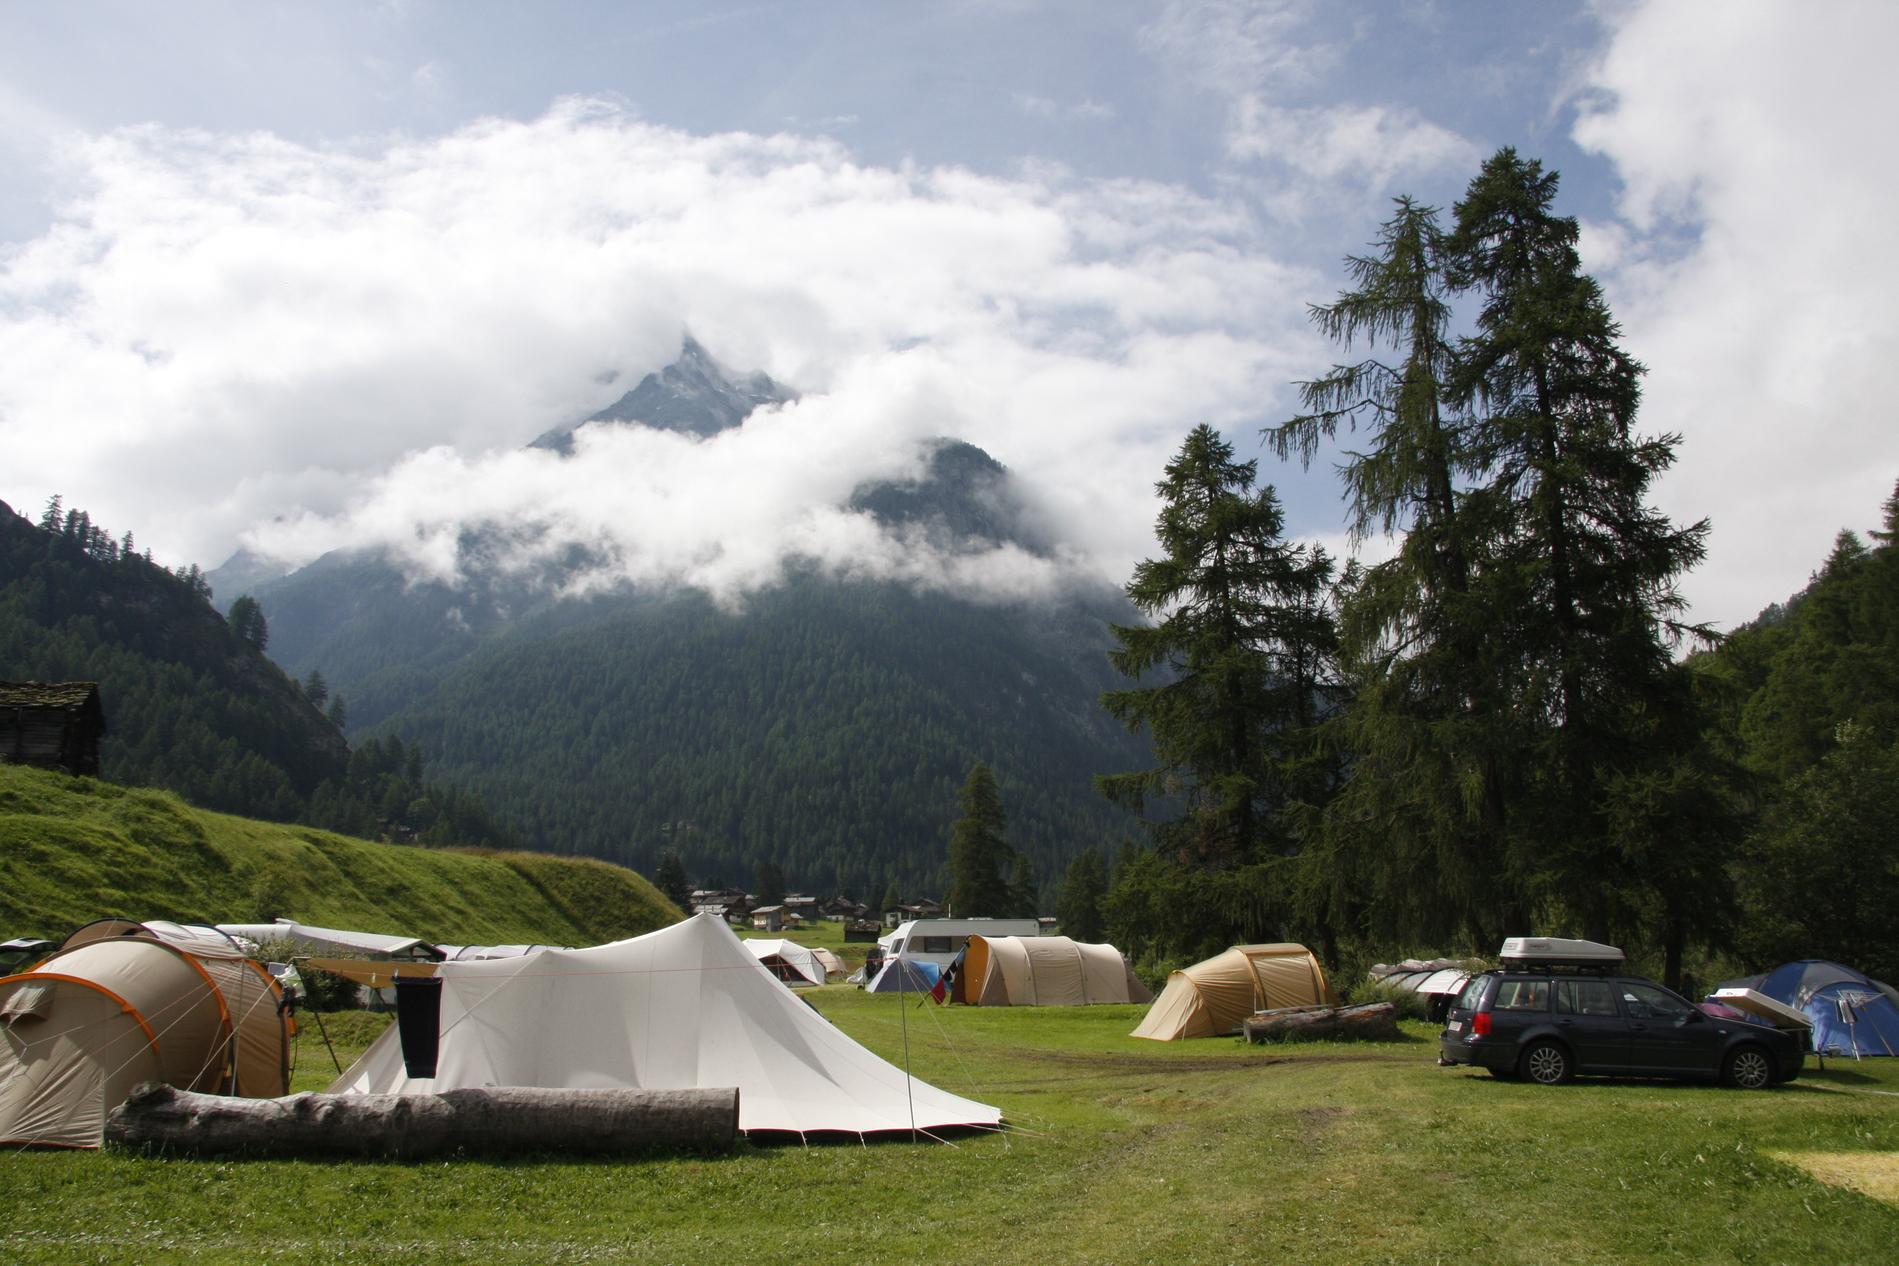 Zwitserland-Les%20Hauderes-Camping%20Molignon-ExtraLarge Wintersport Zwitserland